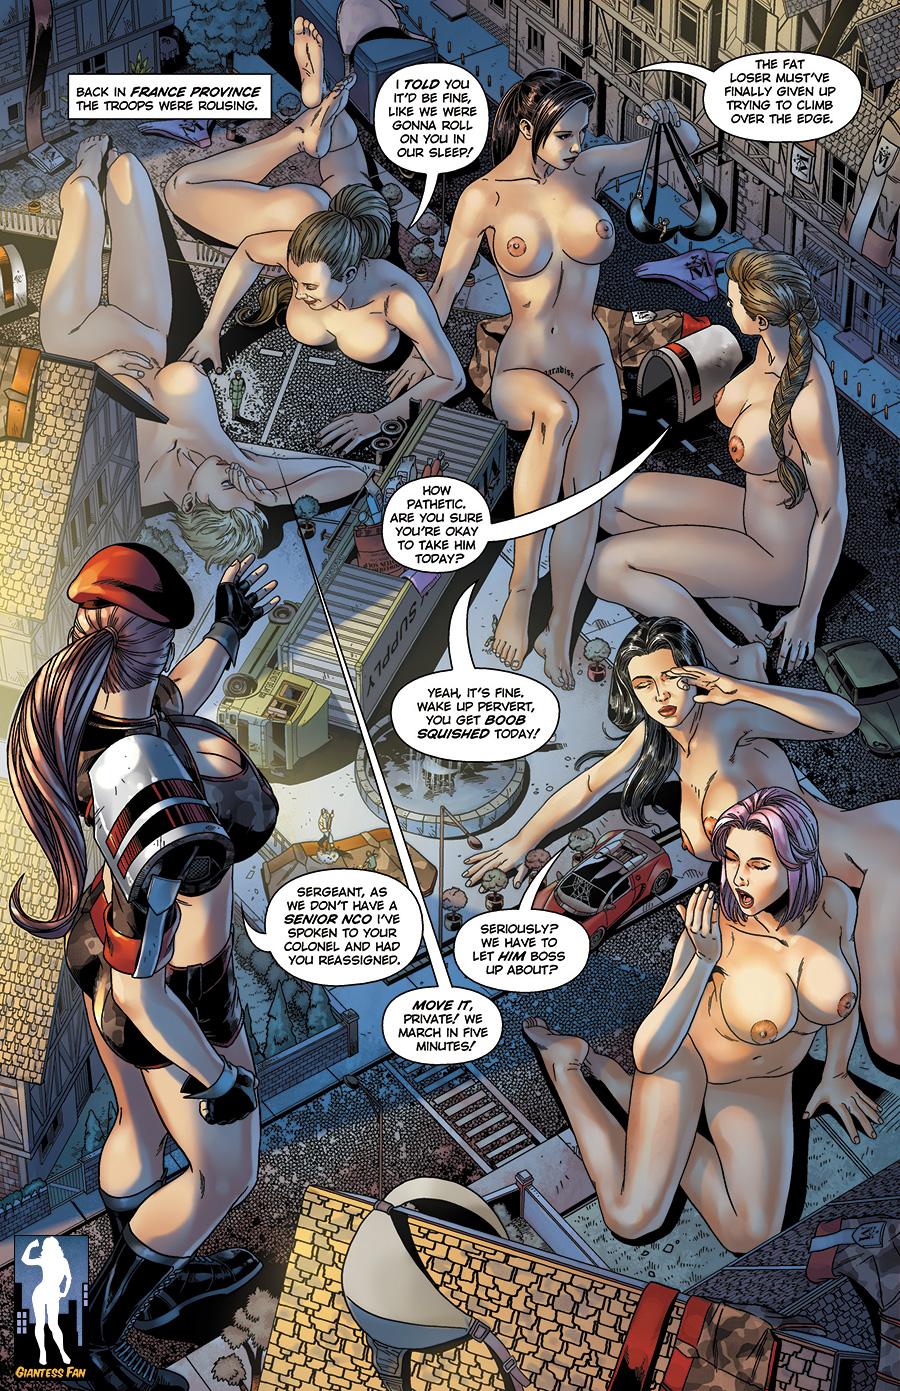 Macrostania Marches On! by giantess-fan-comics